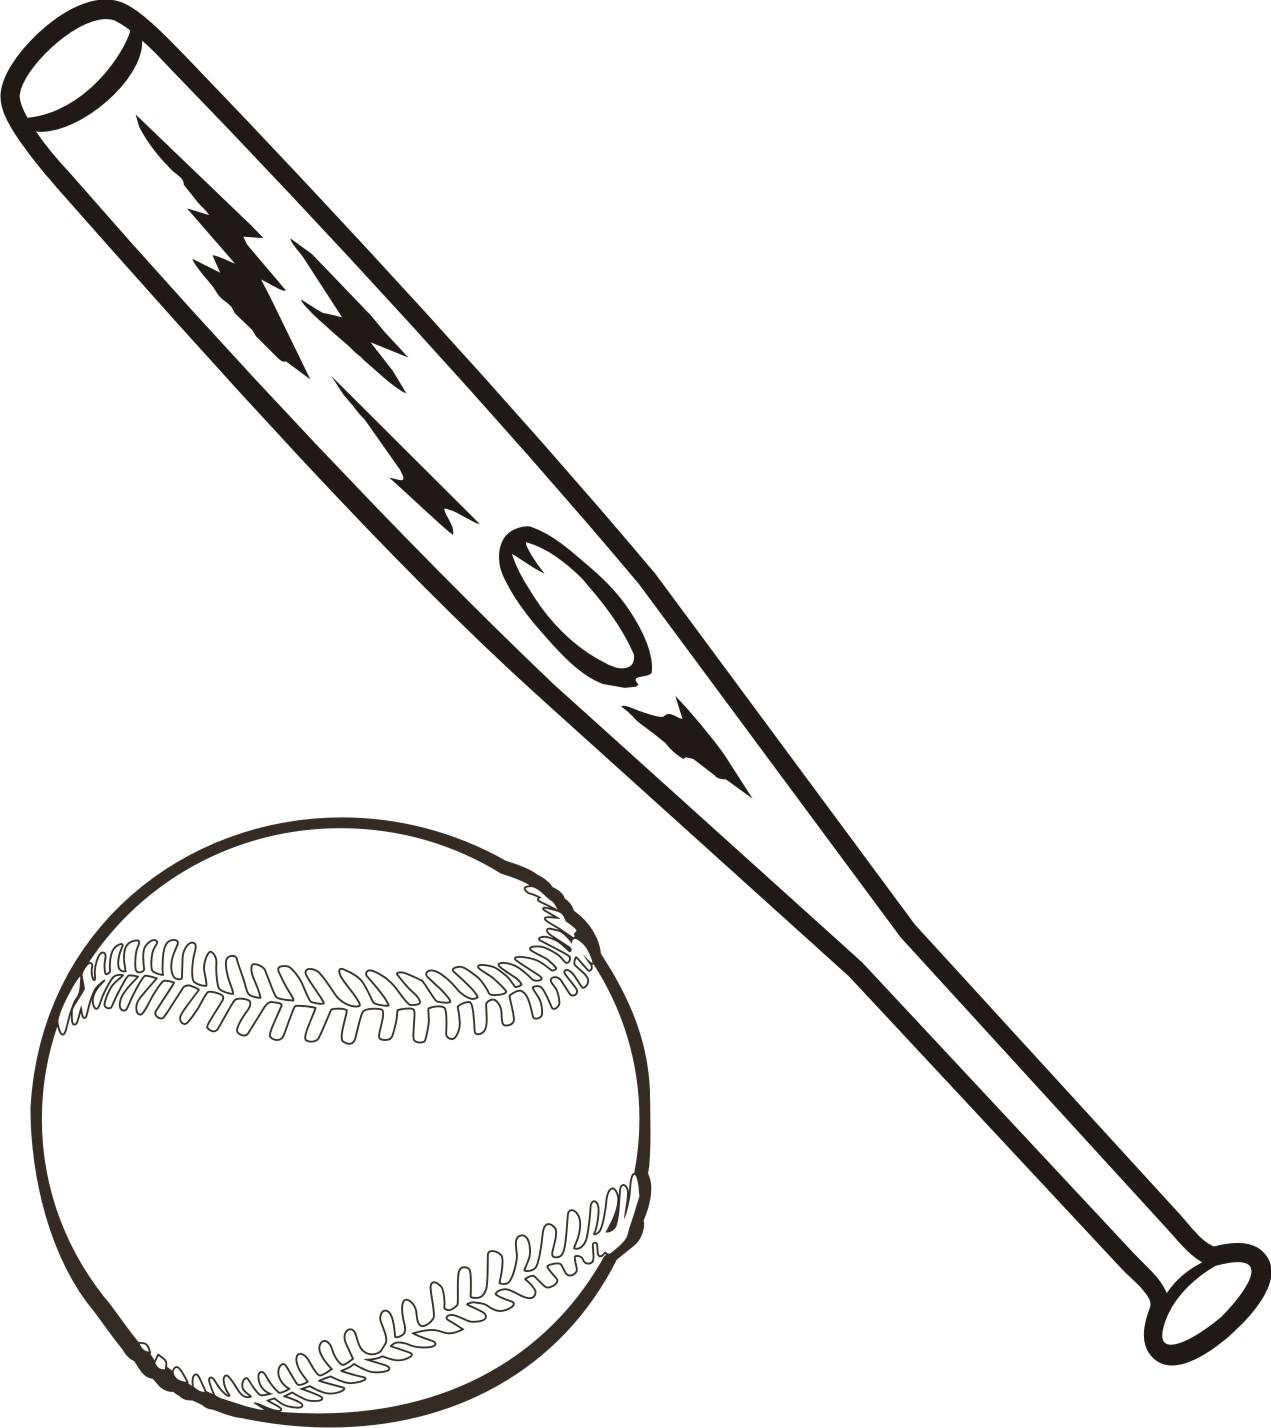 Baseball Bat Black And White Clipart - Clipart Kid